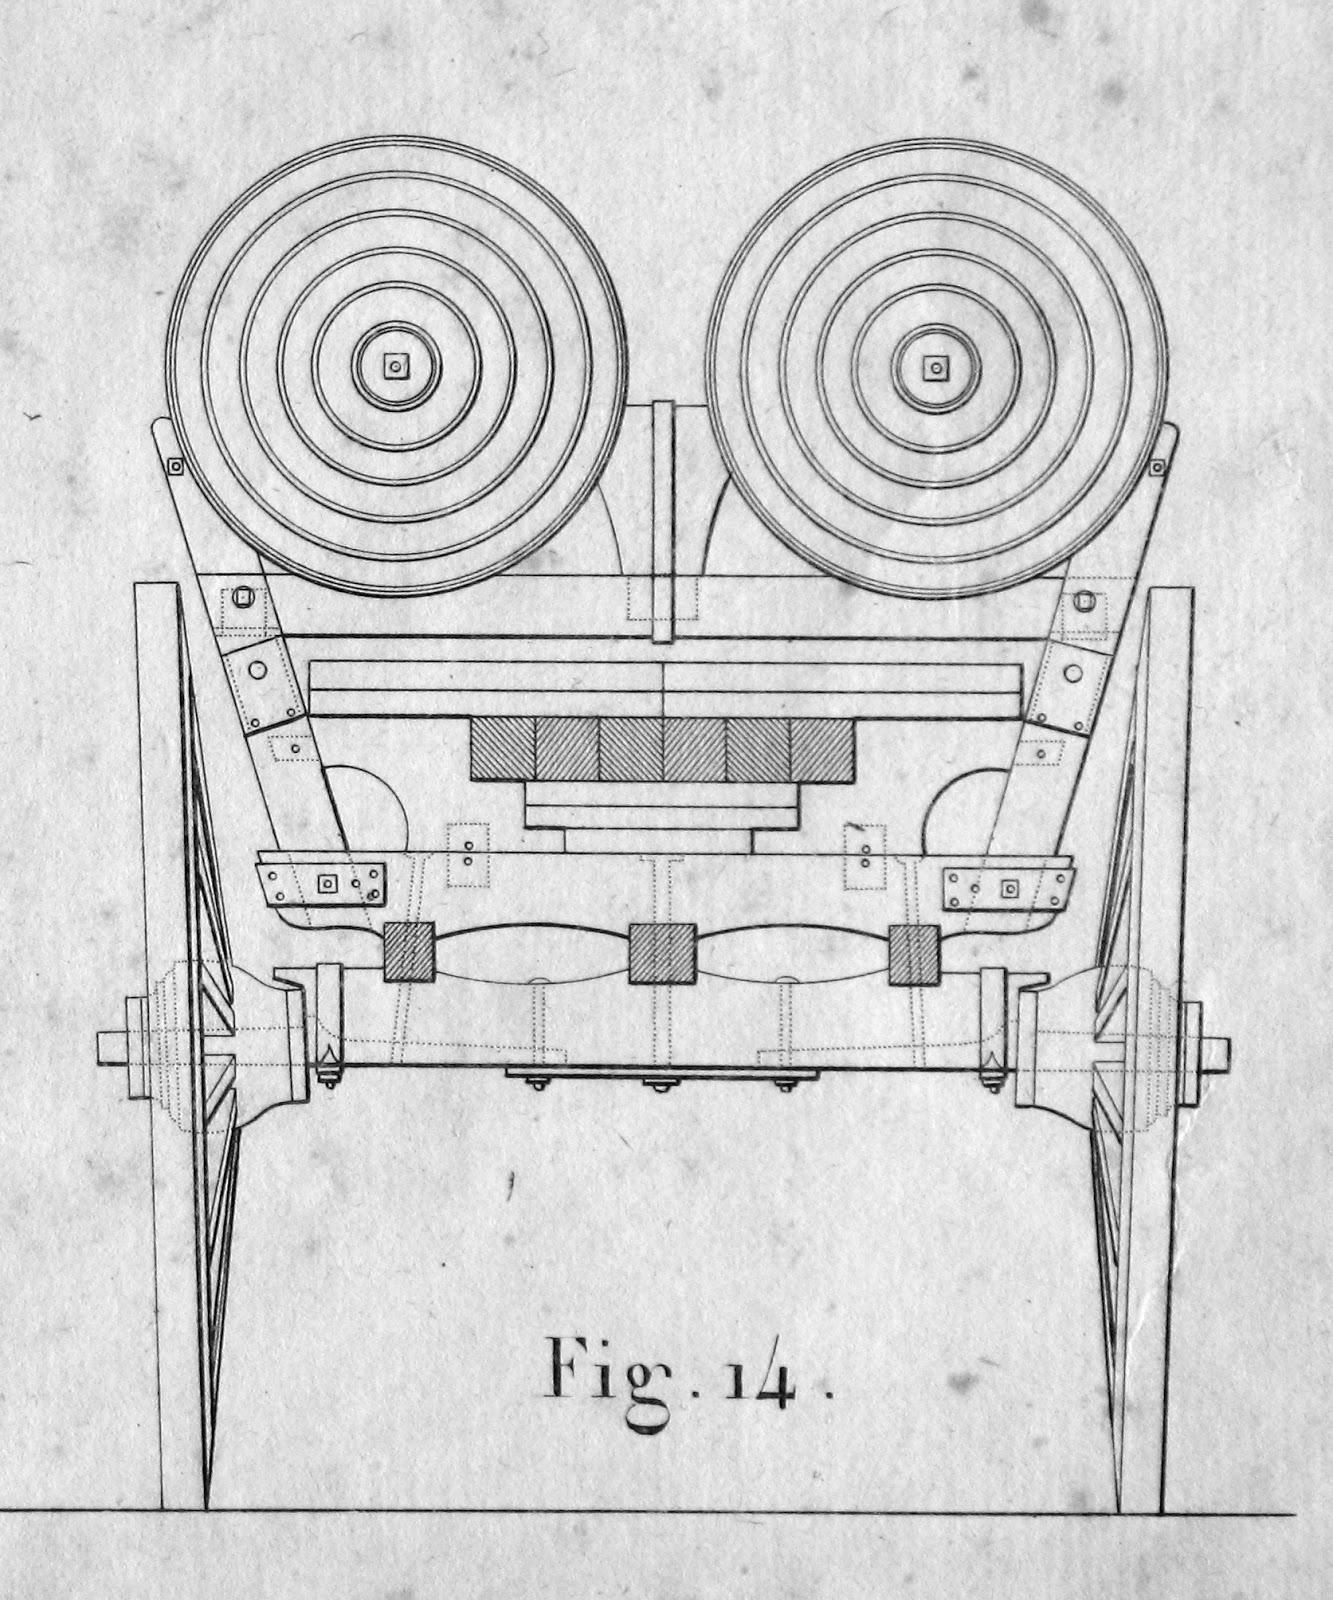 Detail from: Voyages dans la Grande-Bretagne, Dupin, 1821